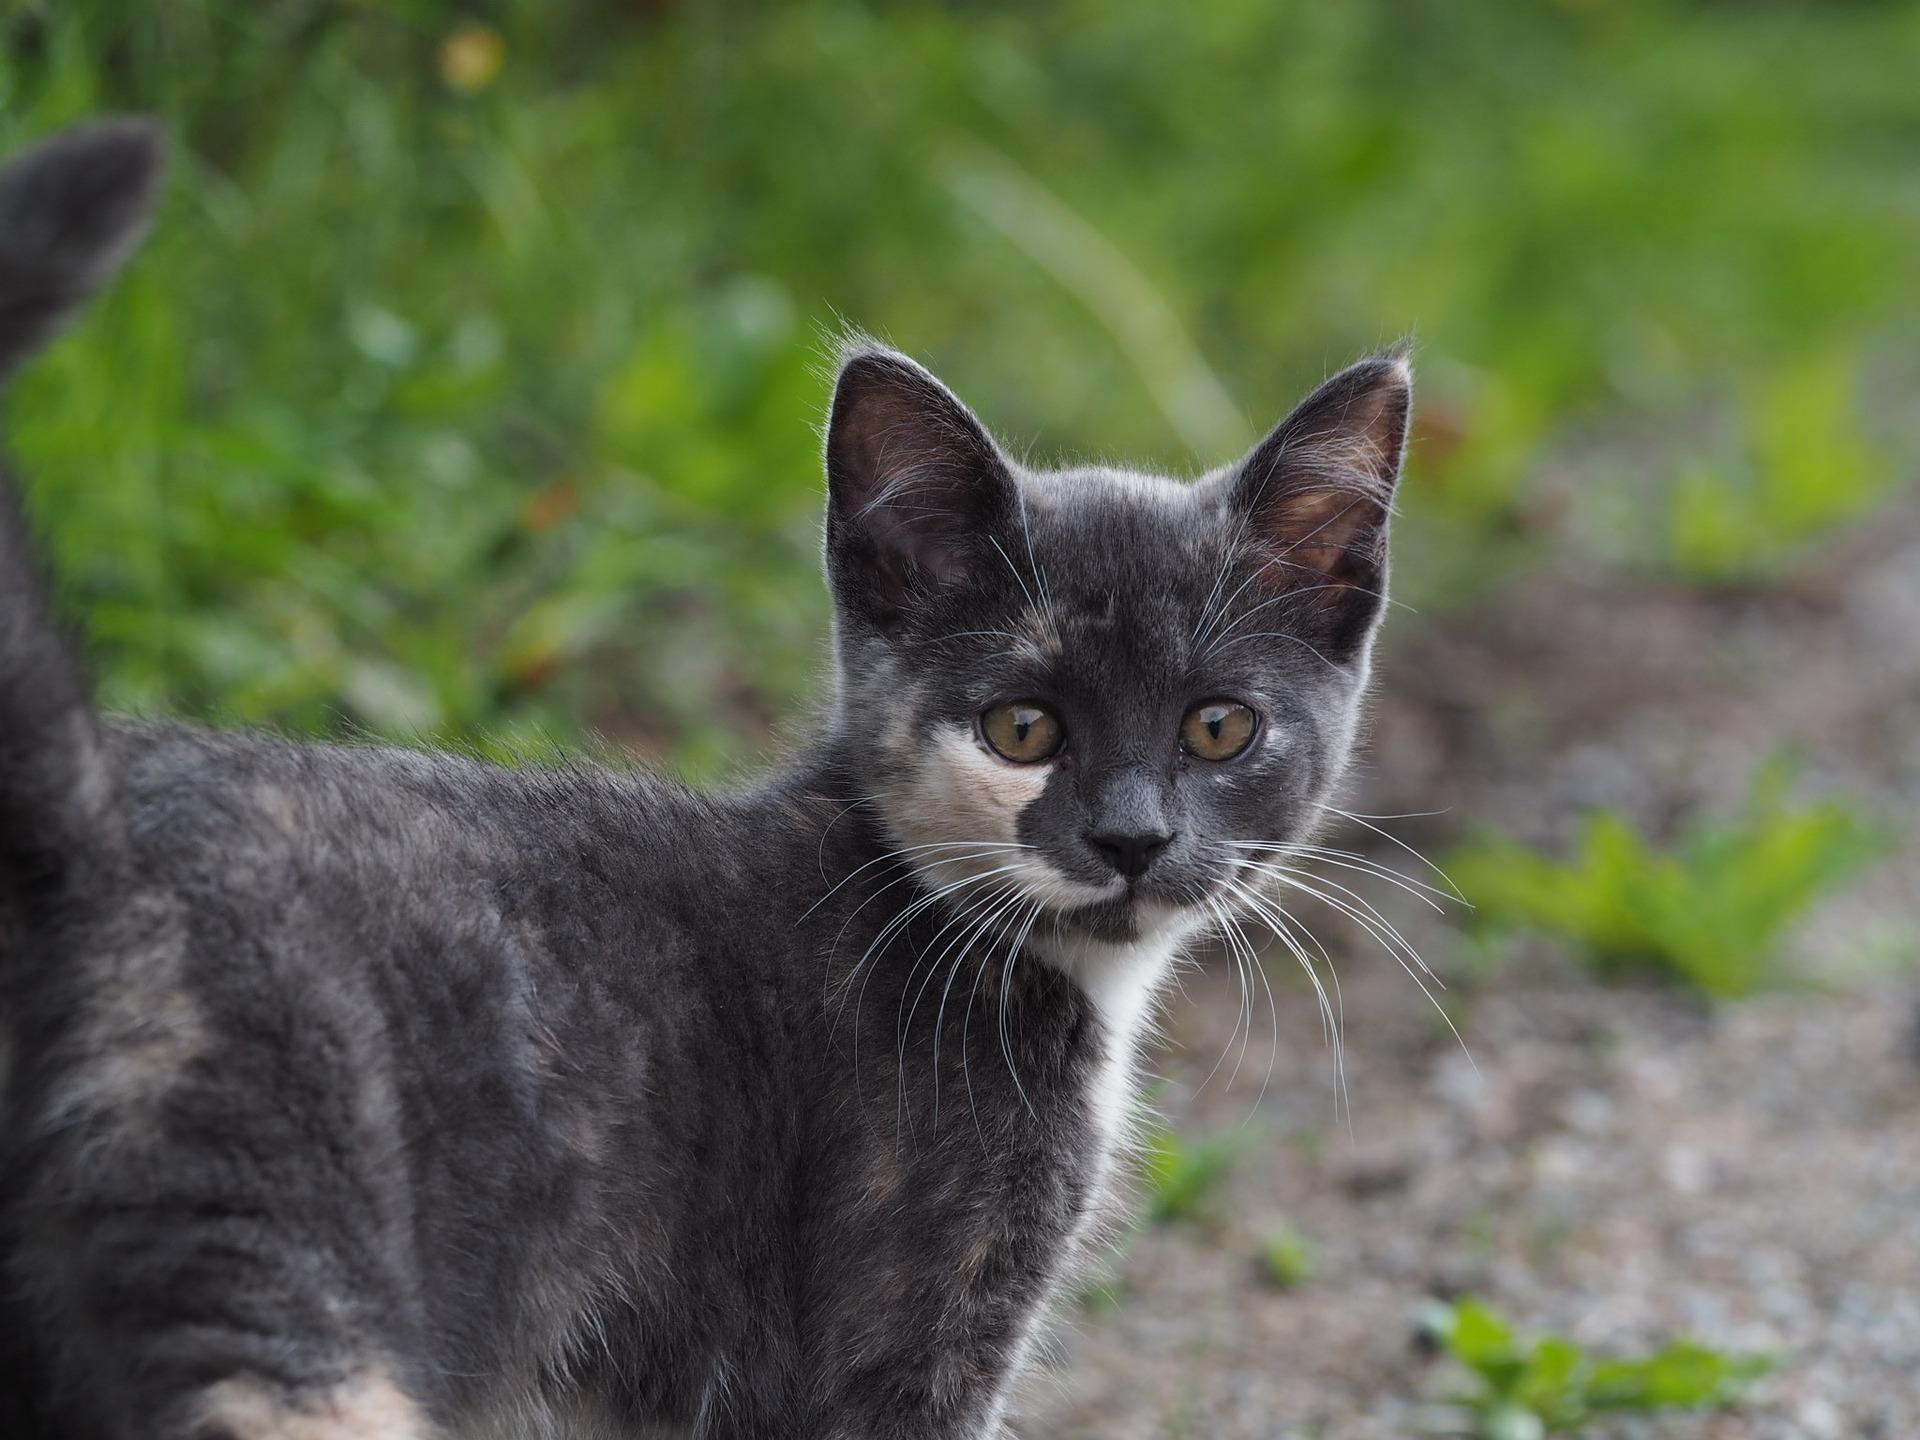 cat-1516289-1920.jpg